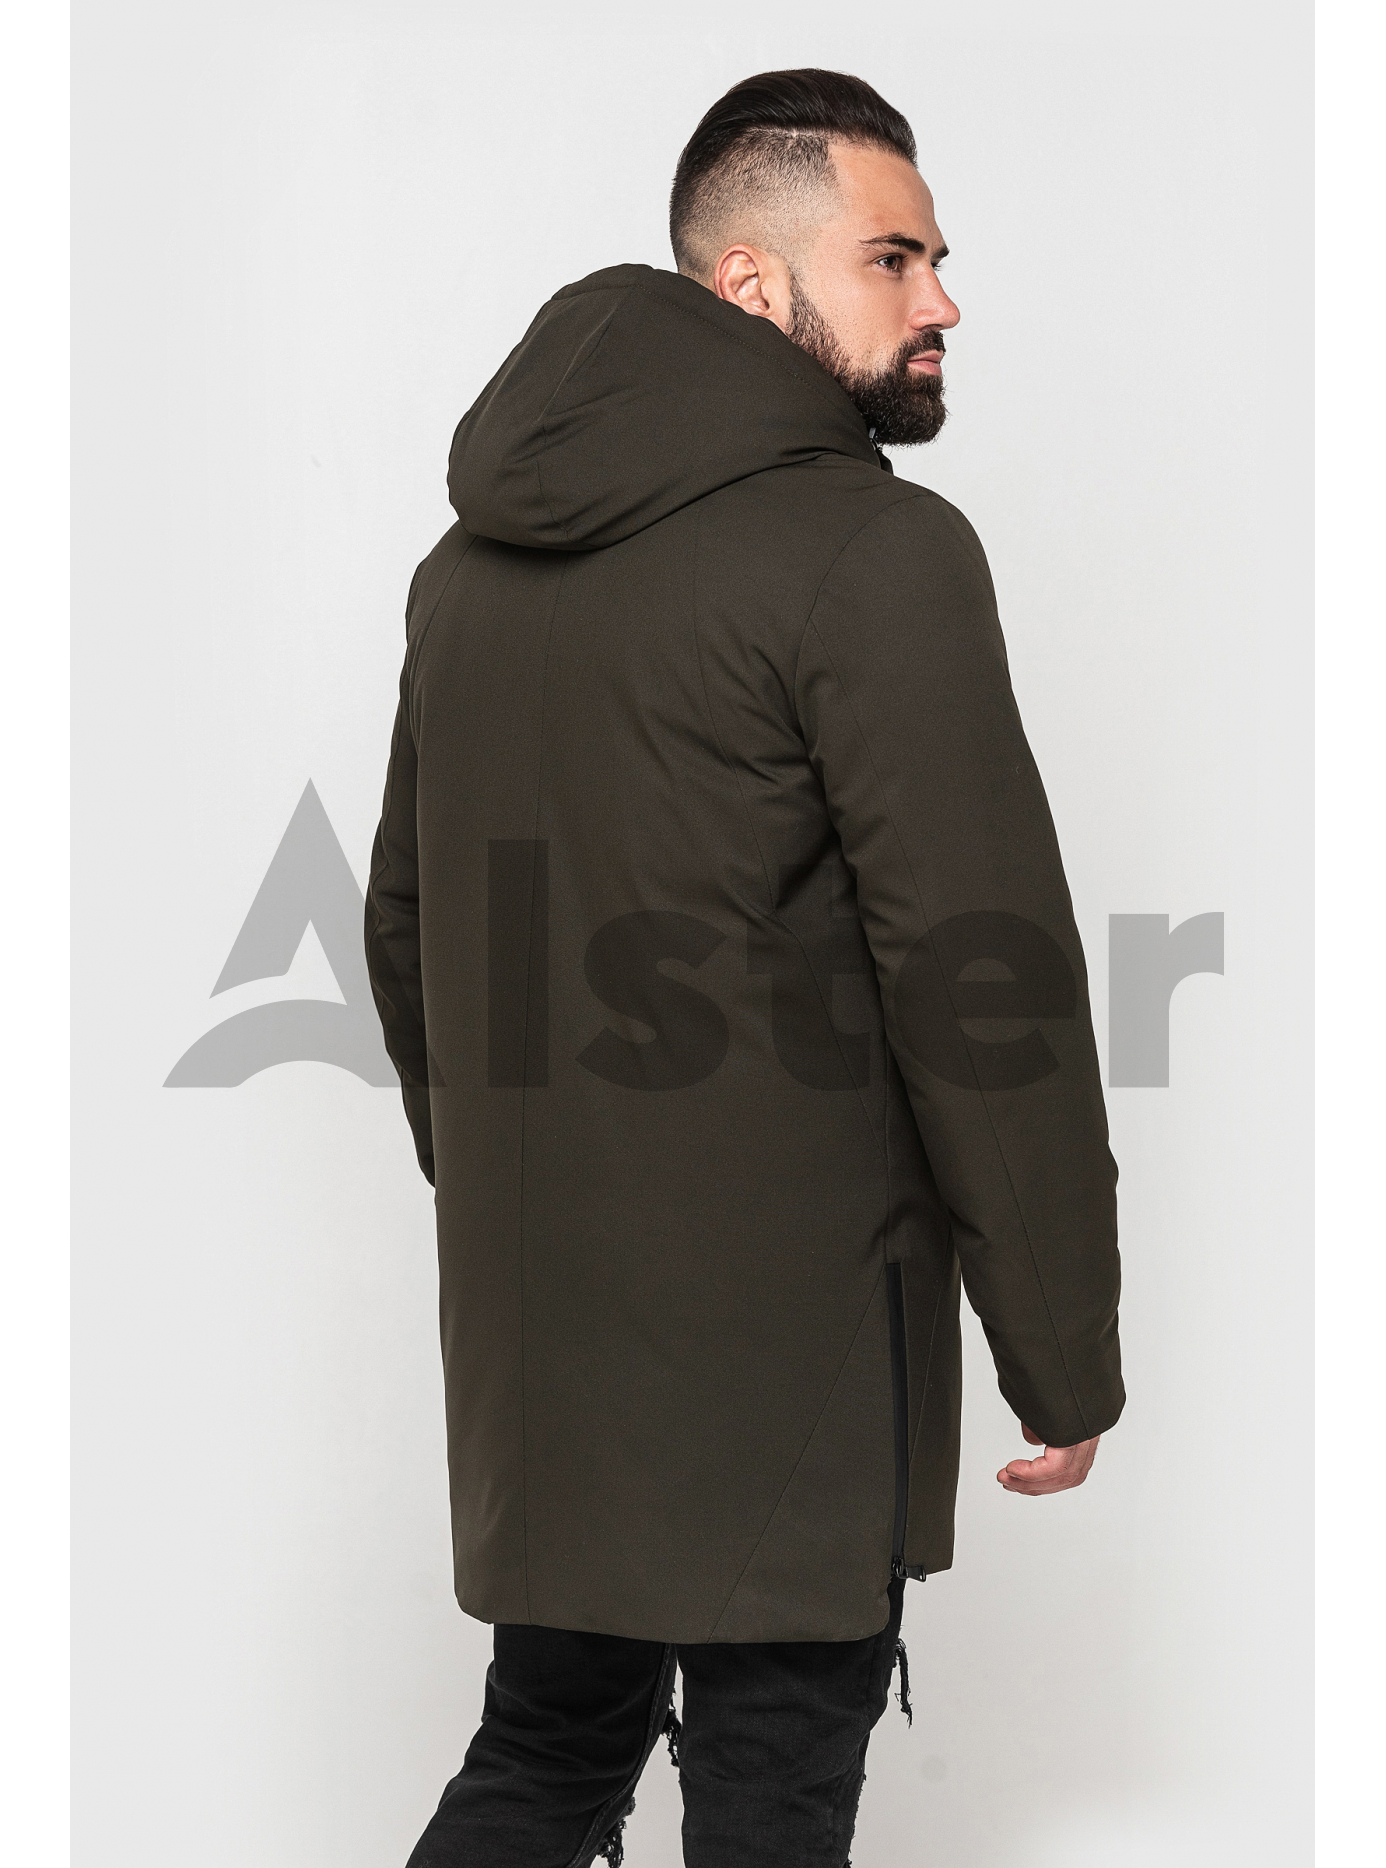 Стильна чоловіча зимова куртка Оливковий 52 (02-MT21023): фото - Alster.ua